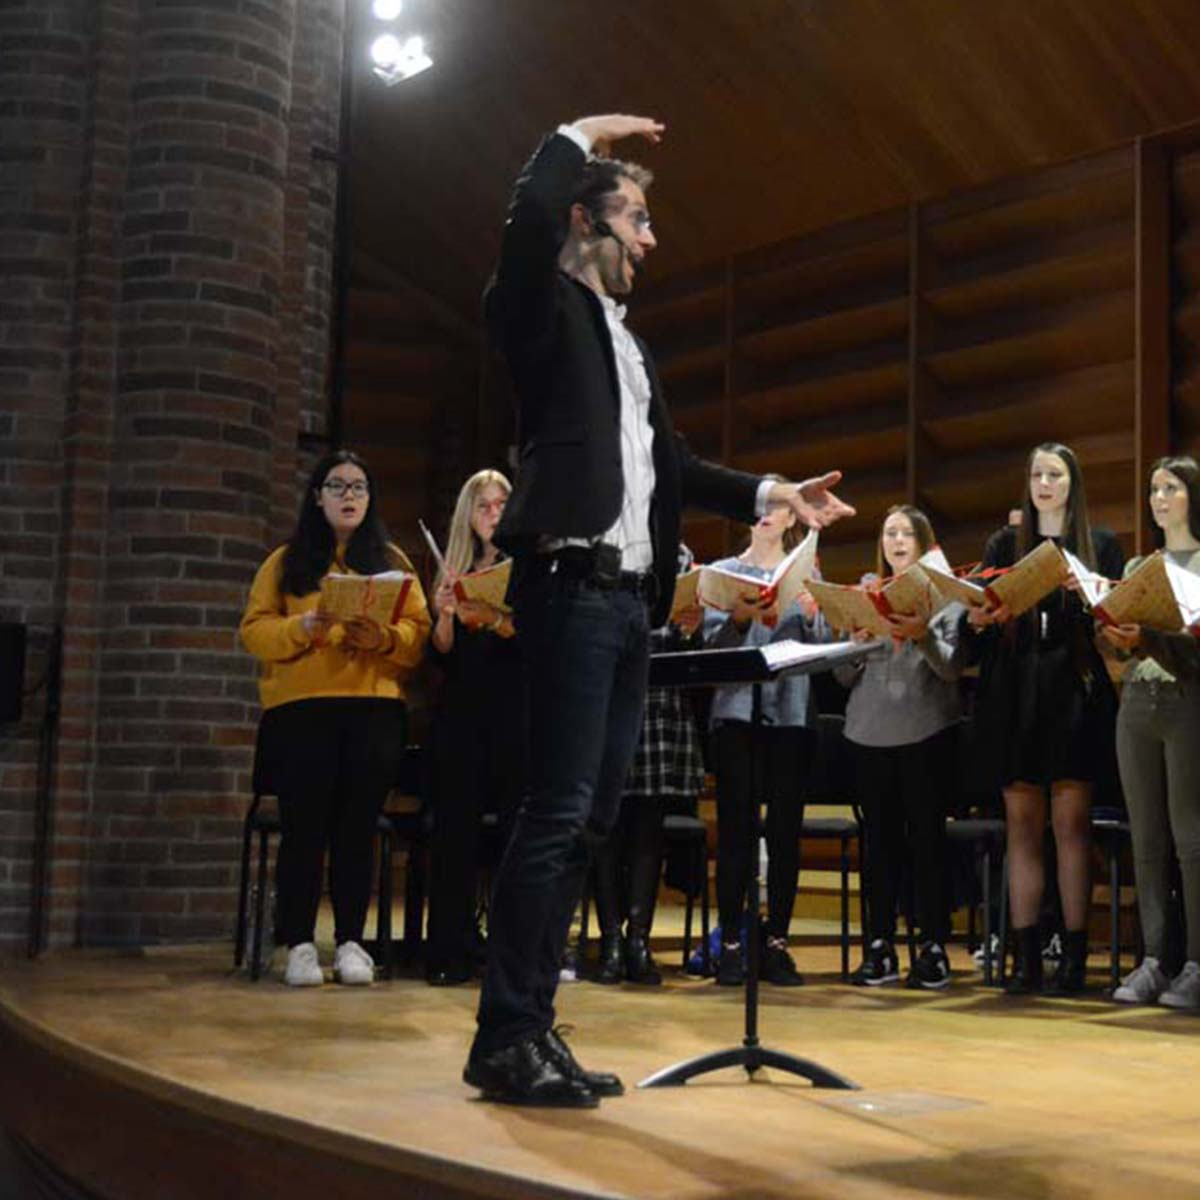 Aerco Academy cantare dirigere comporre management formazione